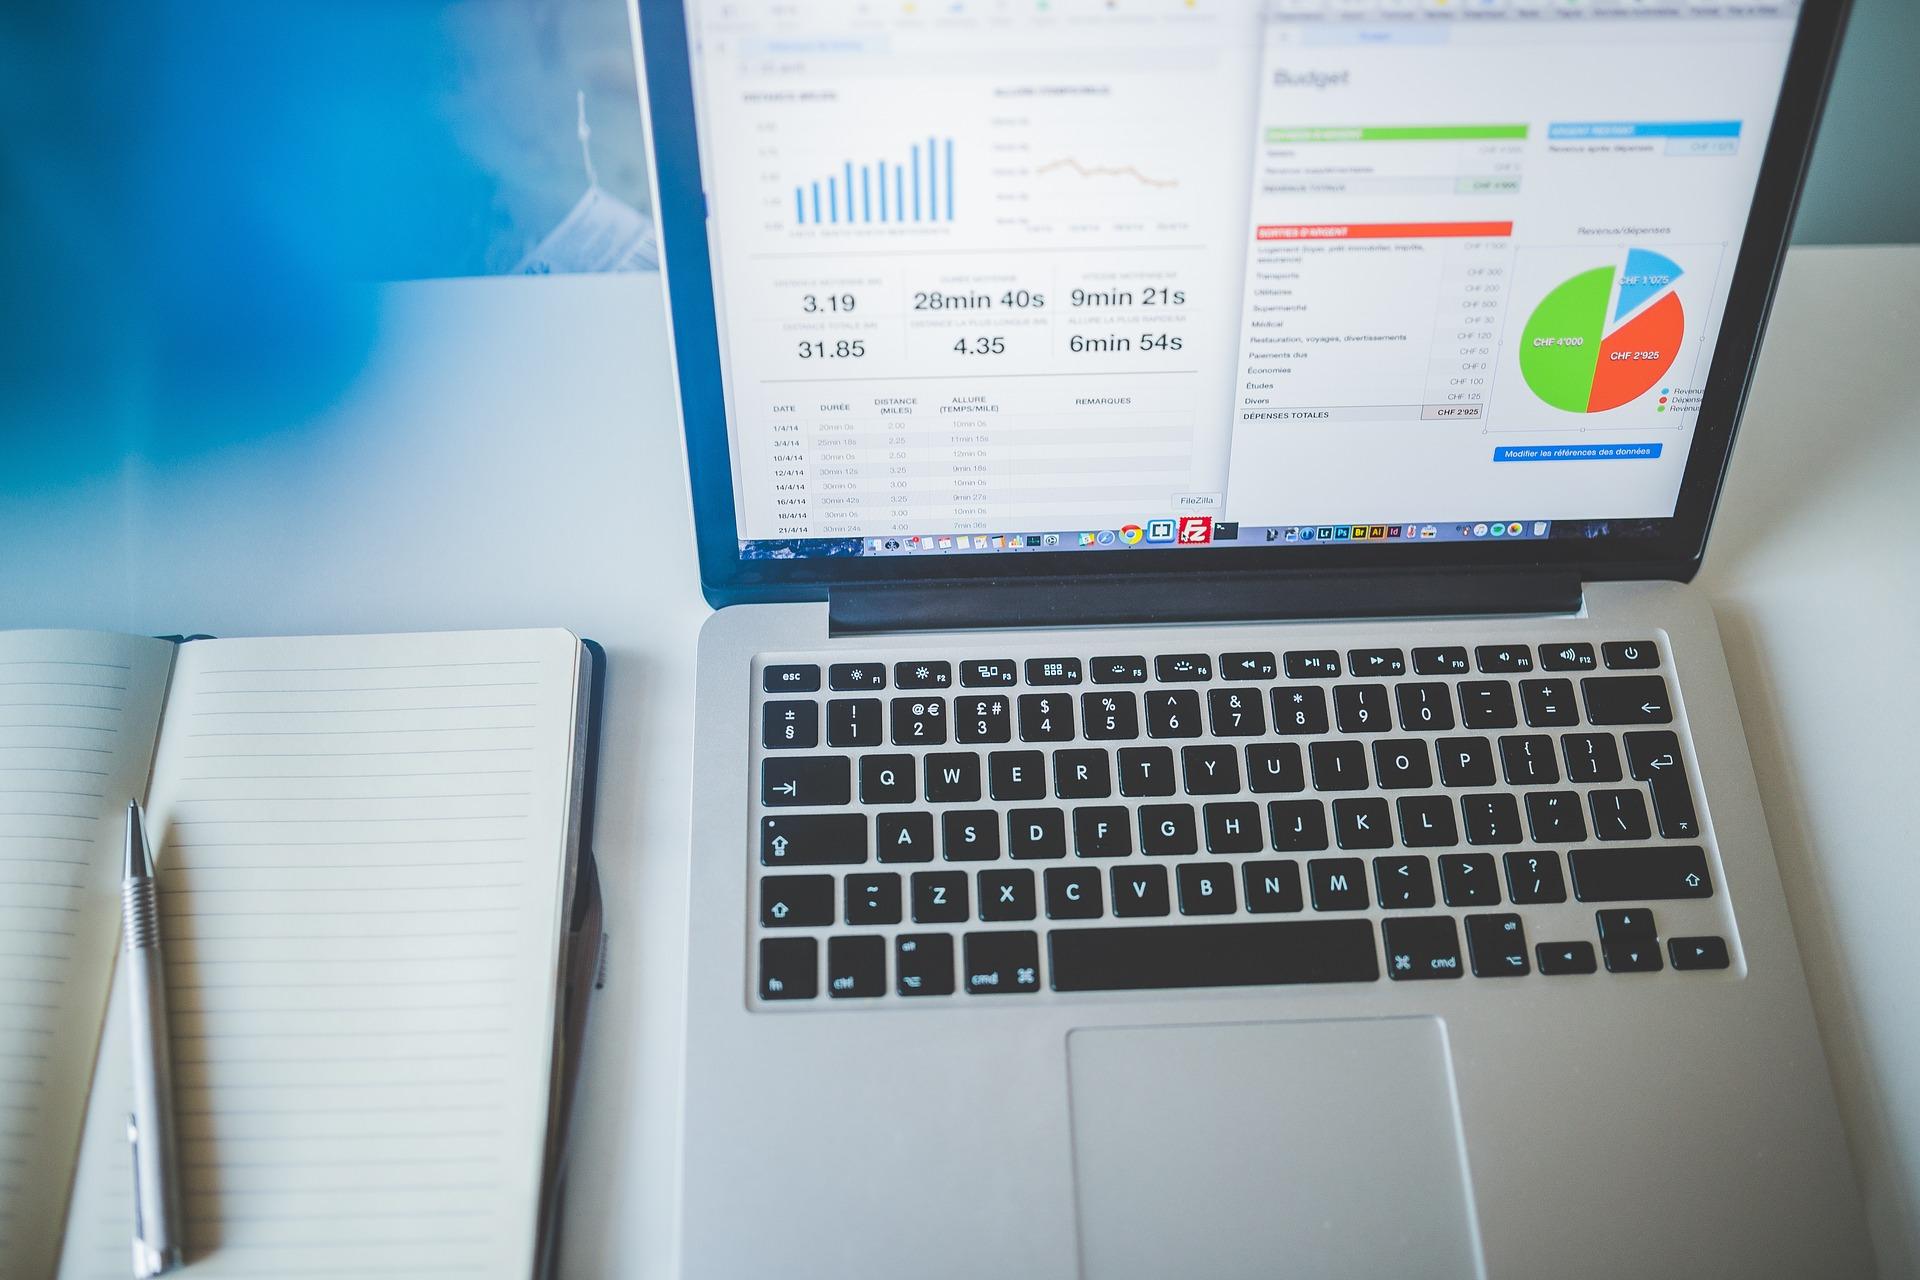 laptop screen showing voip analytics